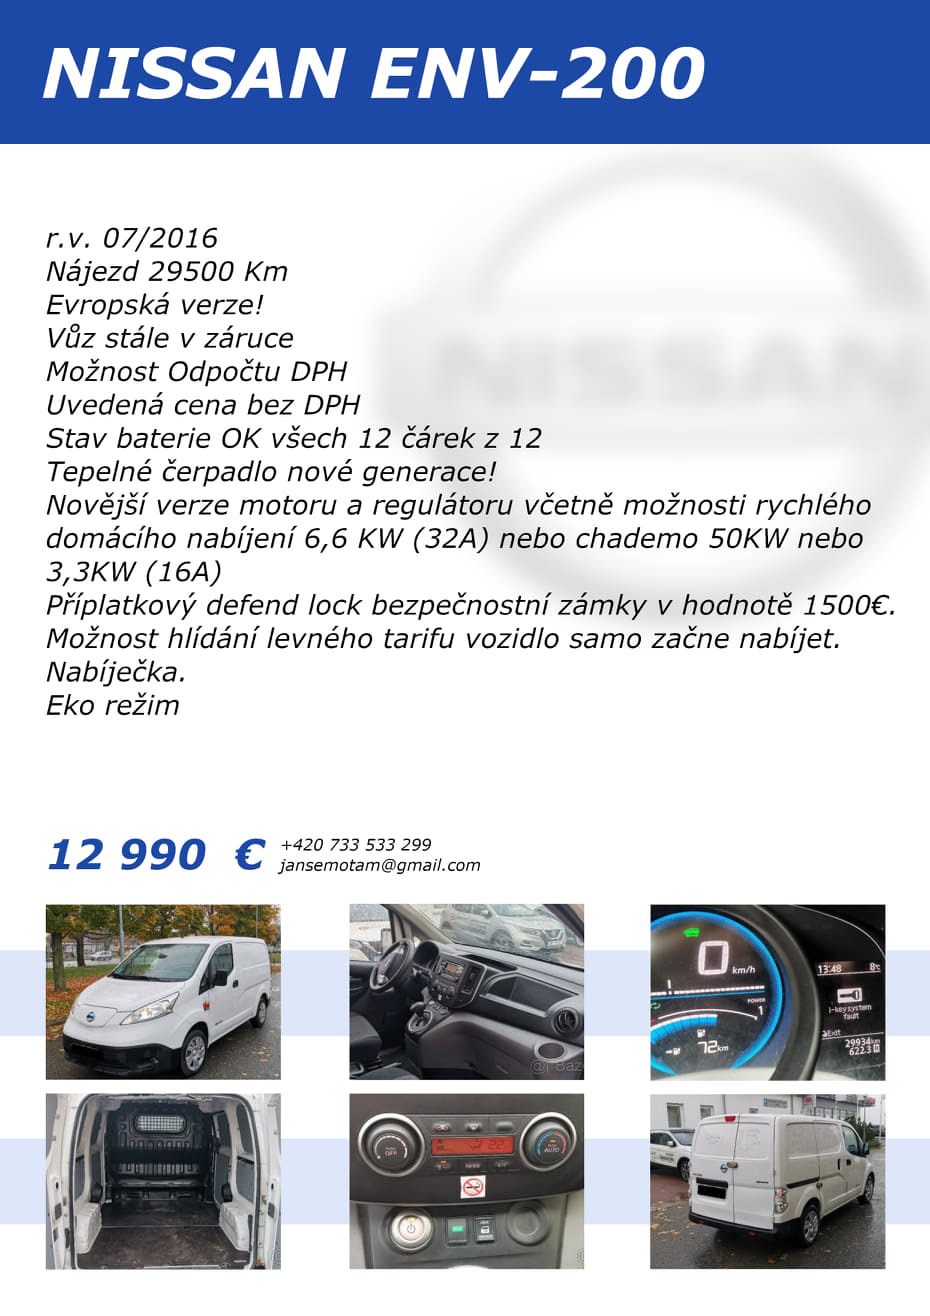 Nissan e-NV200 - 12 990€ bez DPH